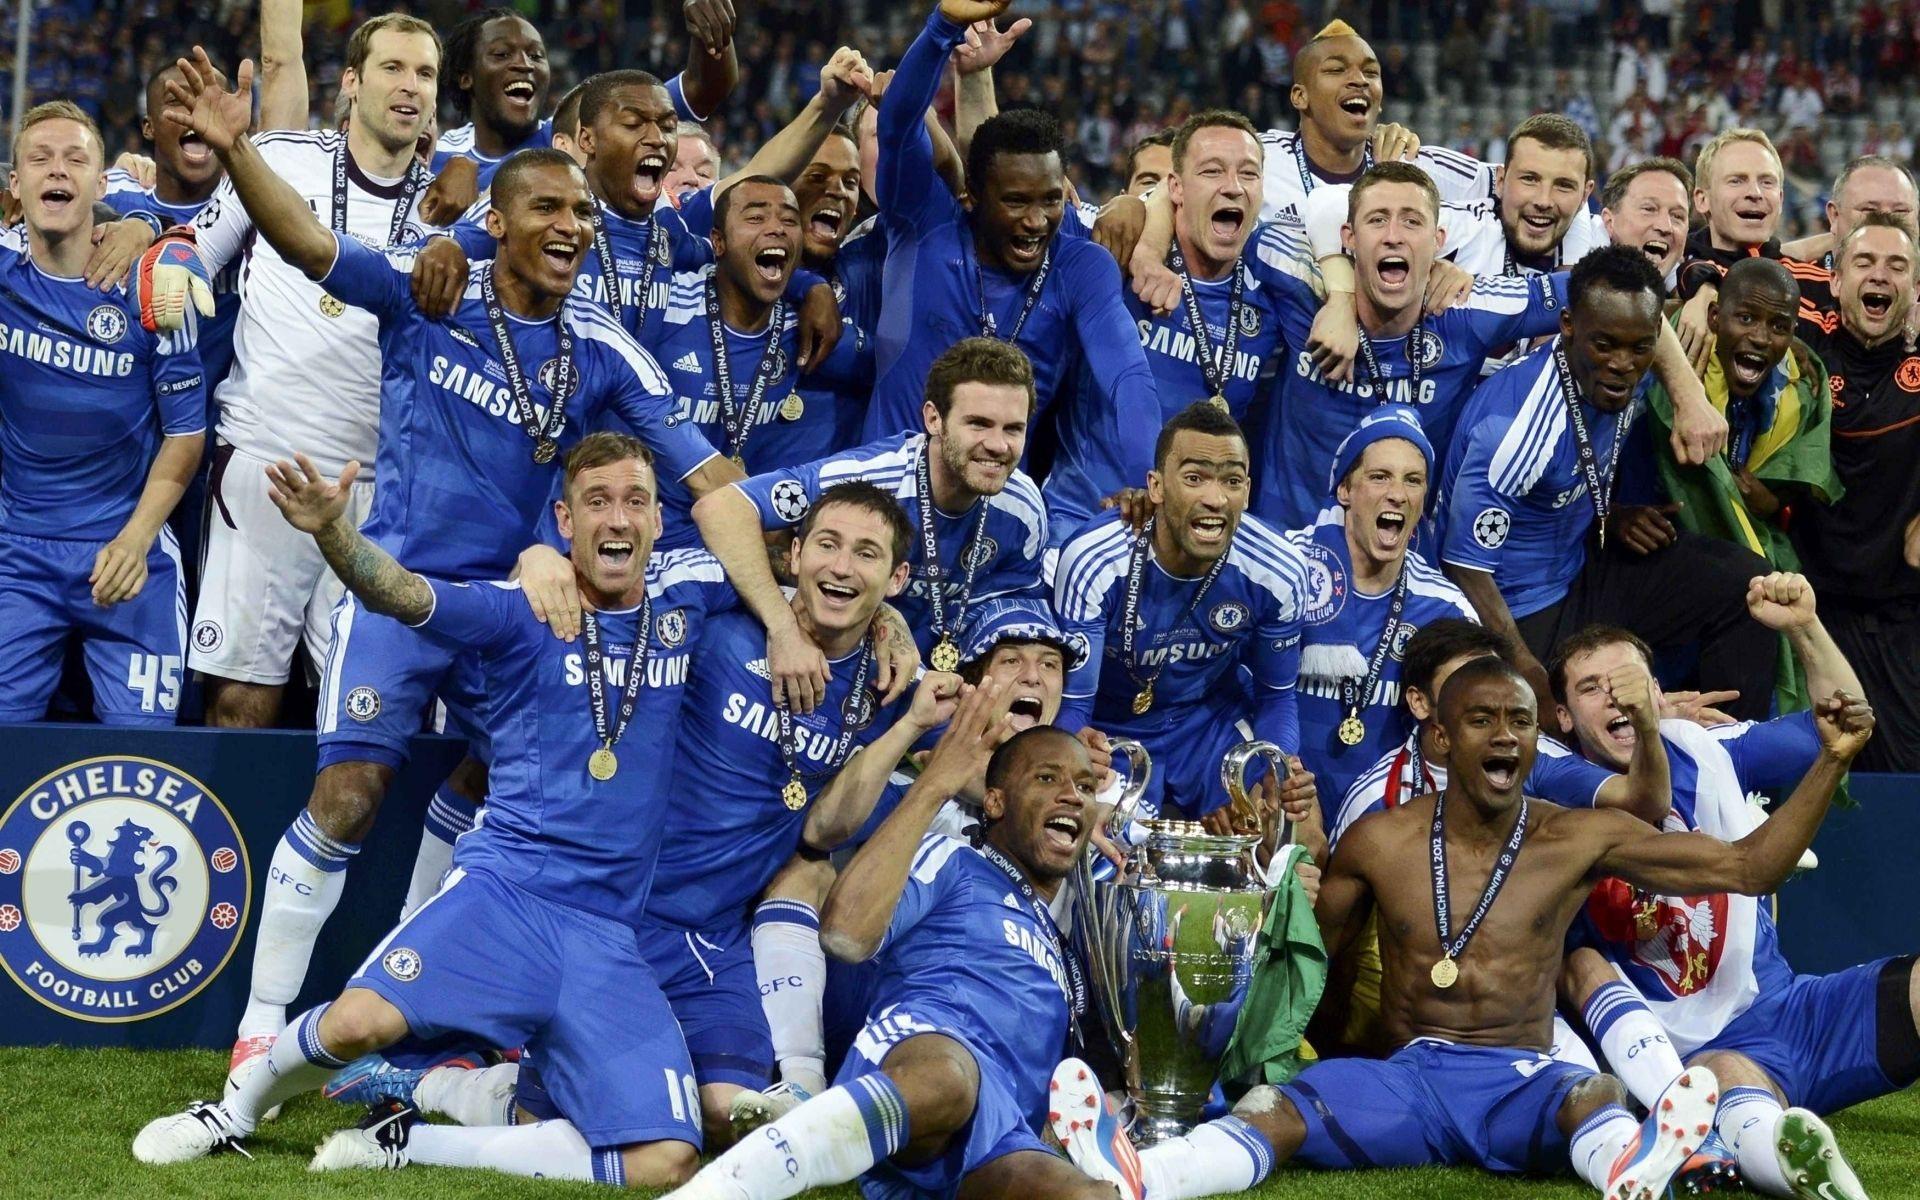 richest football clubs